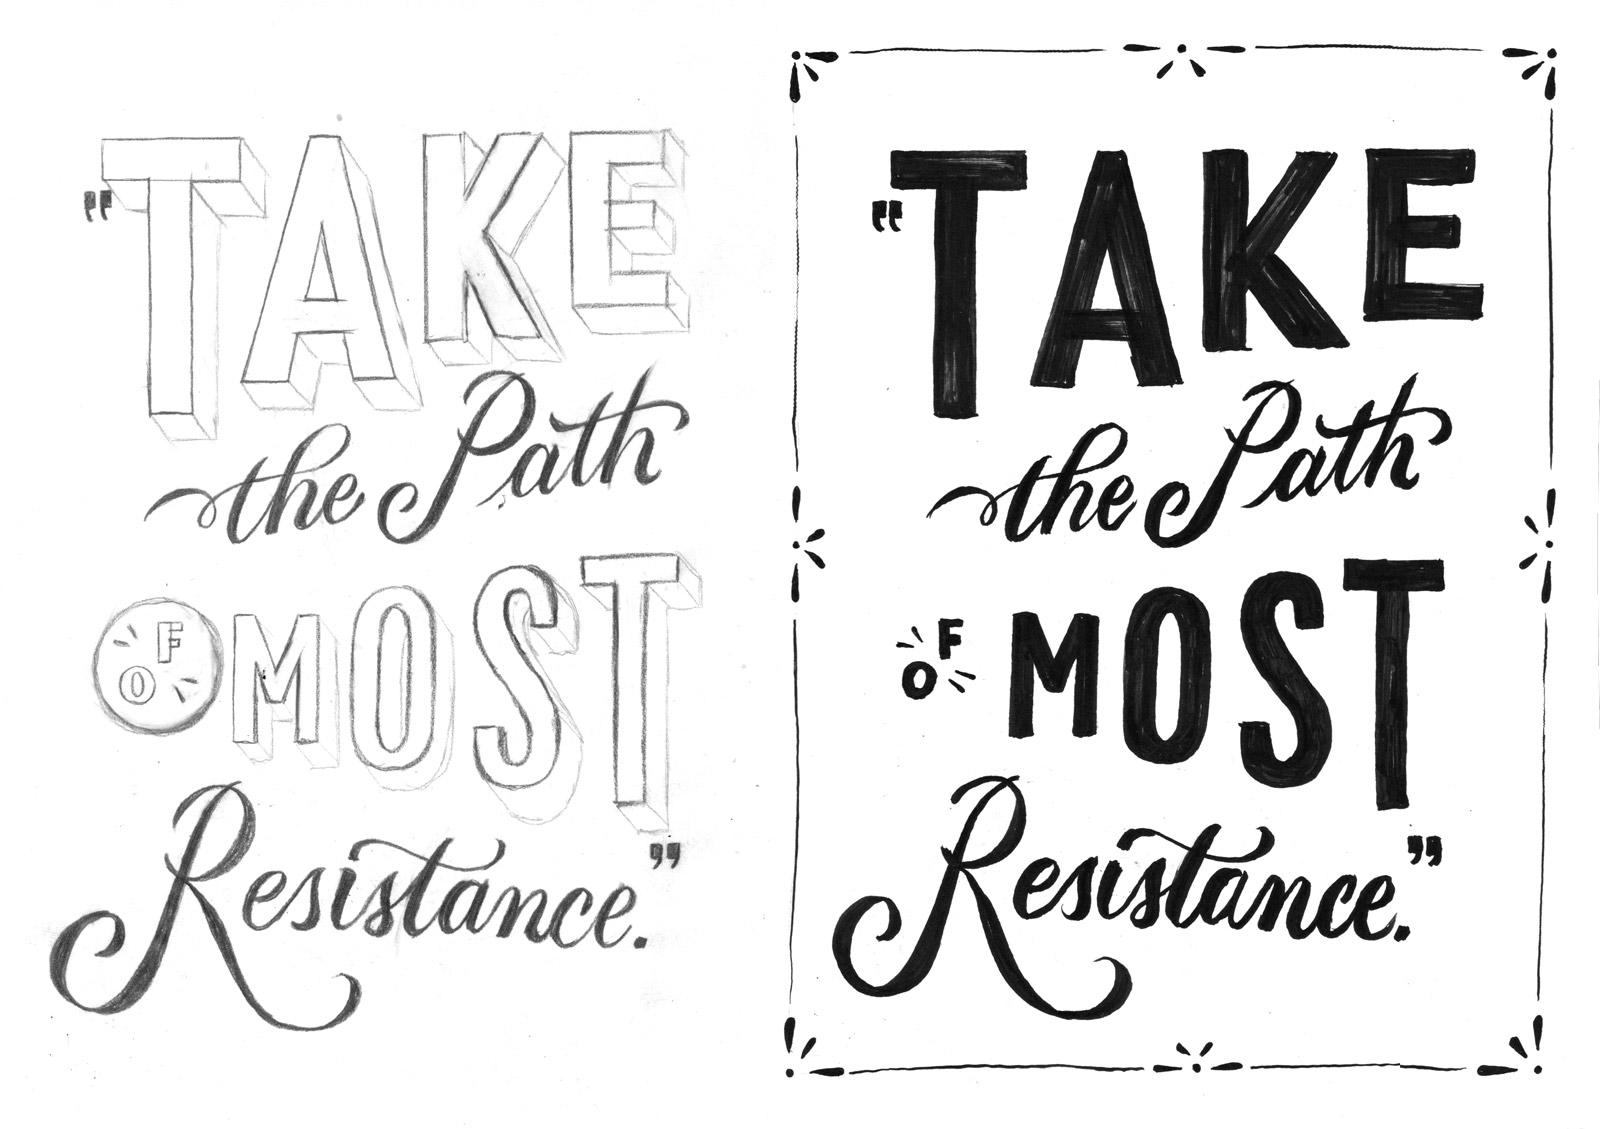 TakeThePathOfMostResistance-sketch-ink.jpg